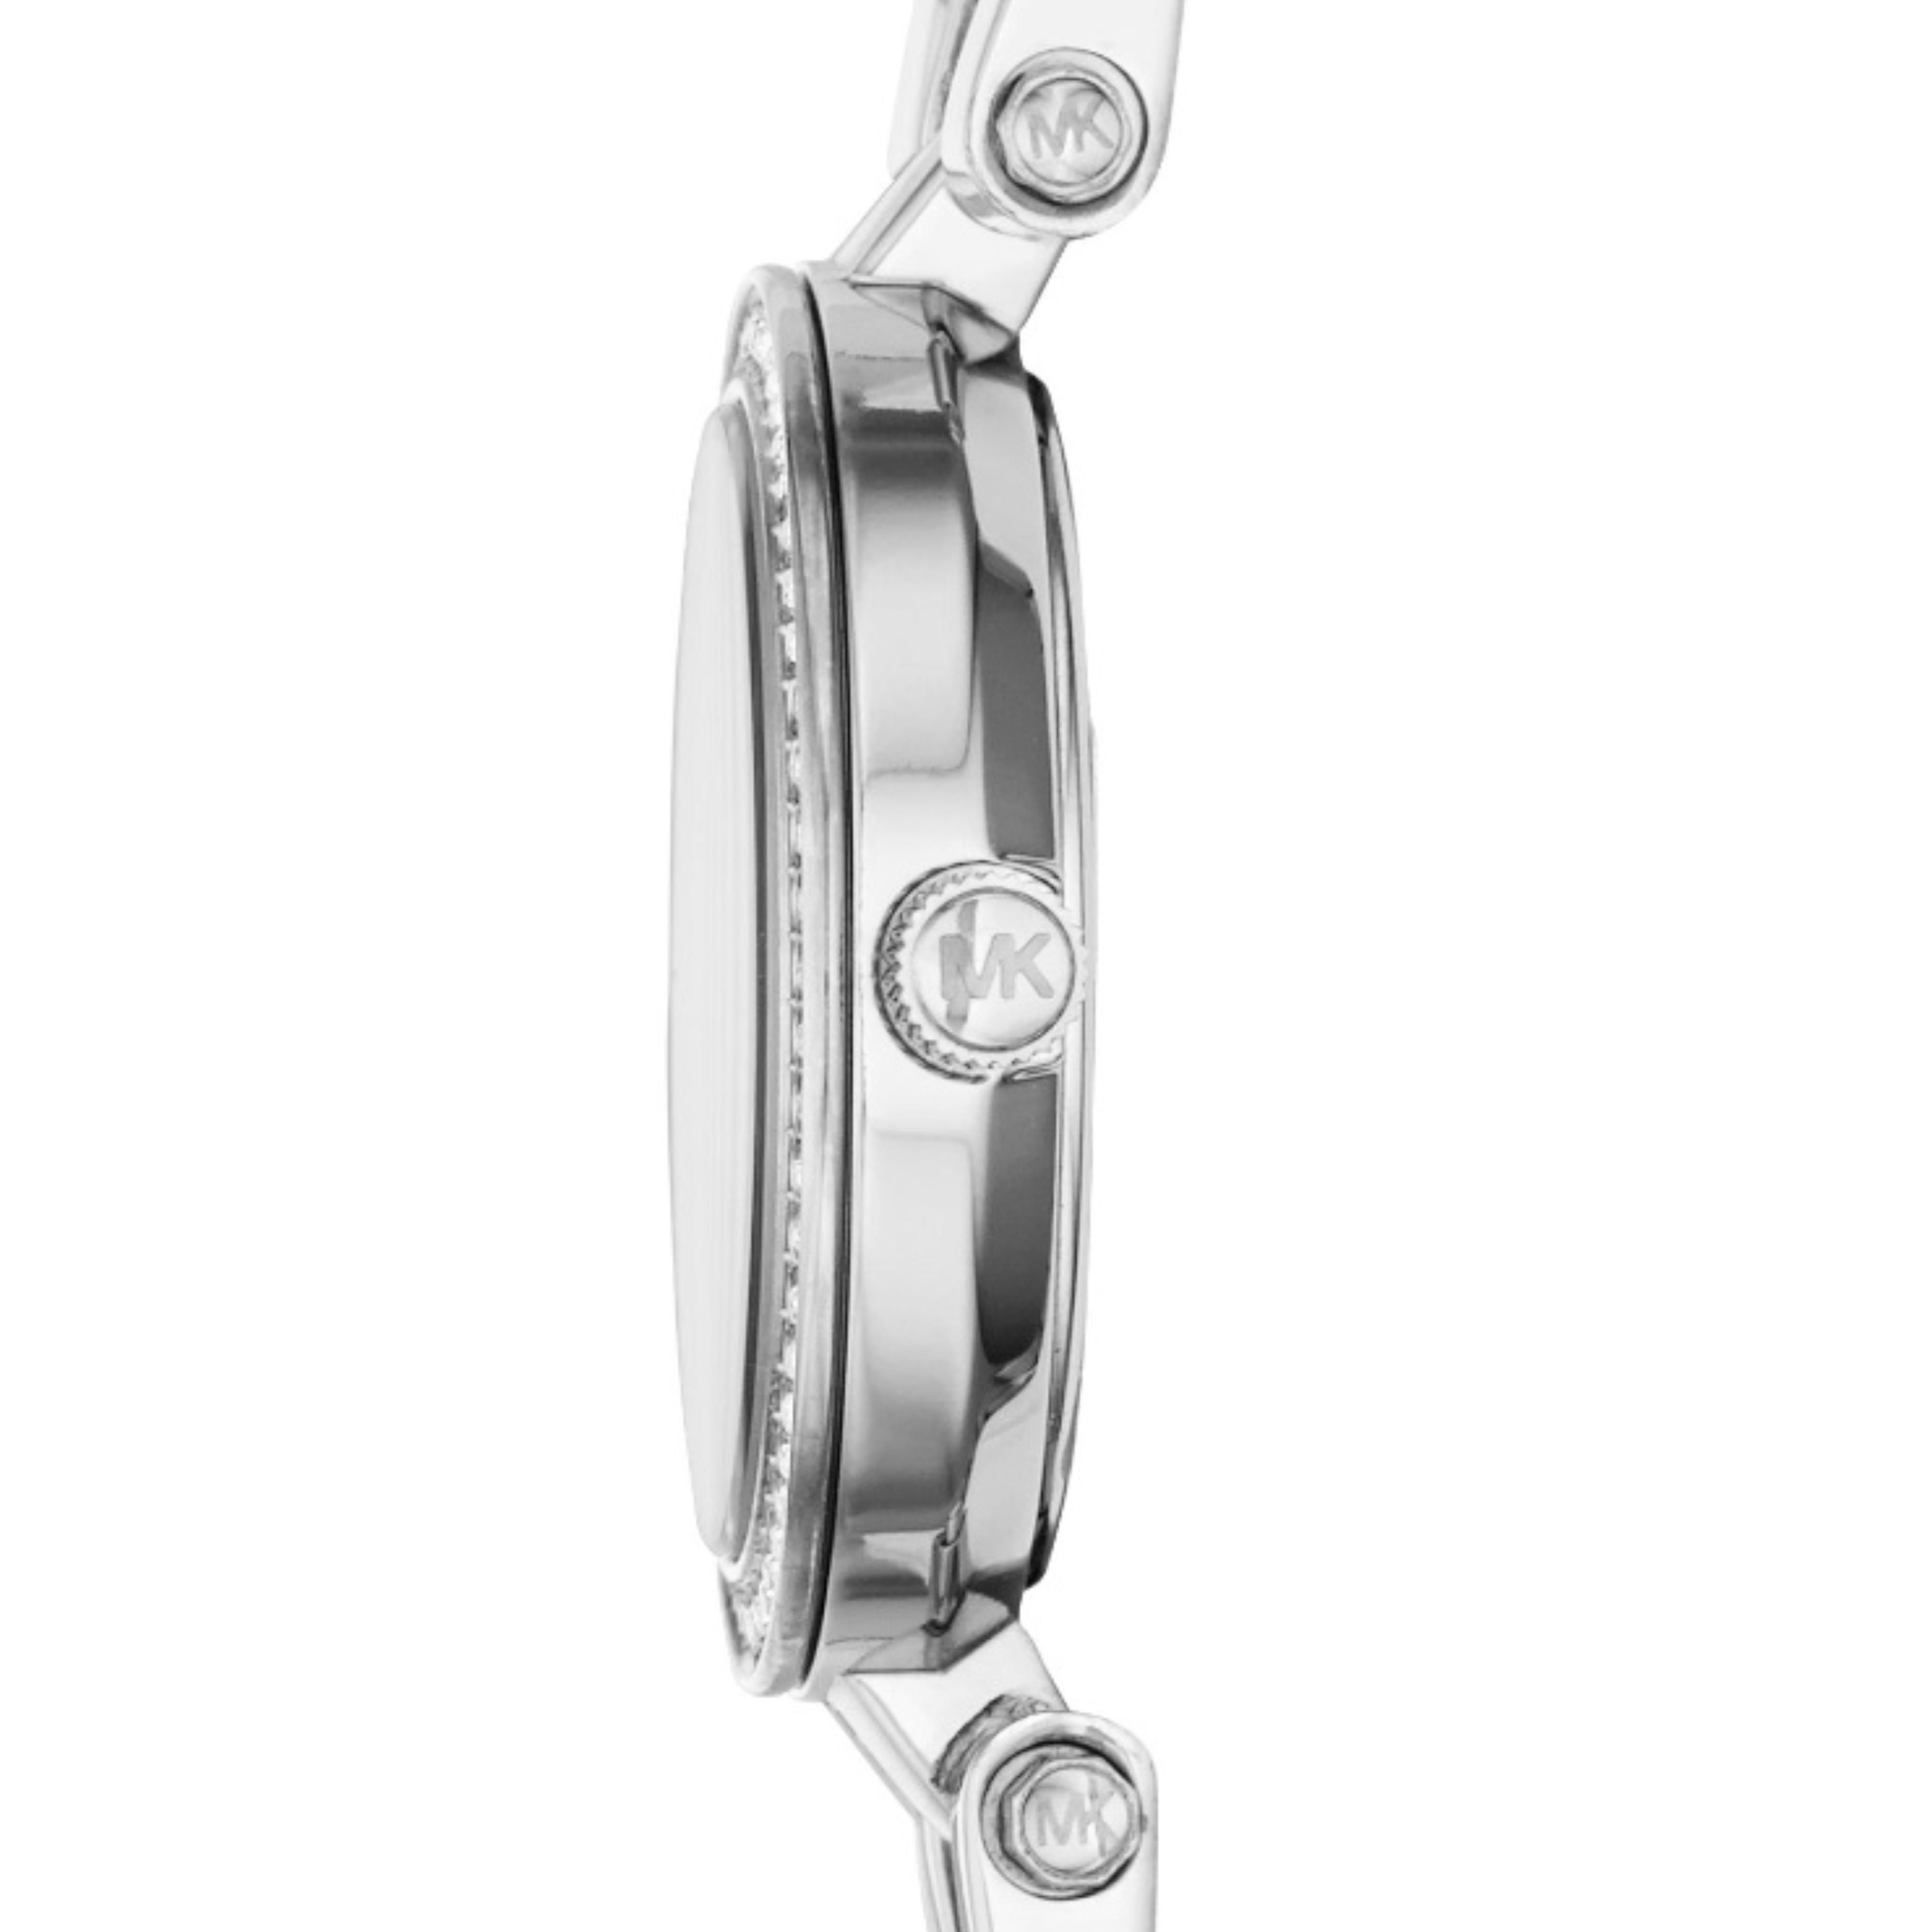 Sentinel Michael Kors Petite Darci Women s Watch│Round Dial│Silver Bracelet  Band│MK3294 d32a92e799